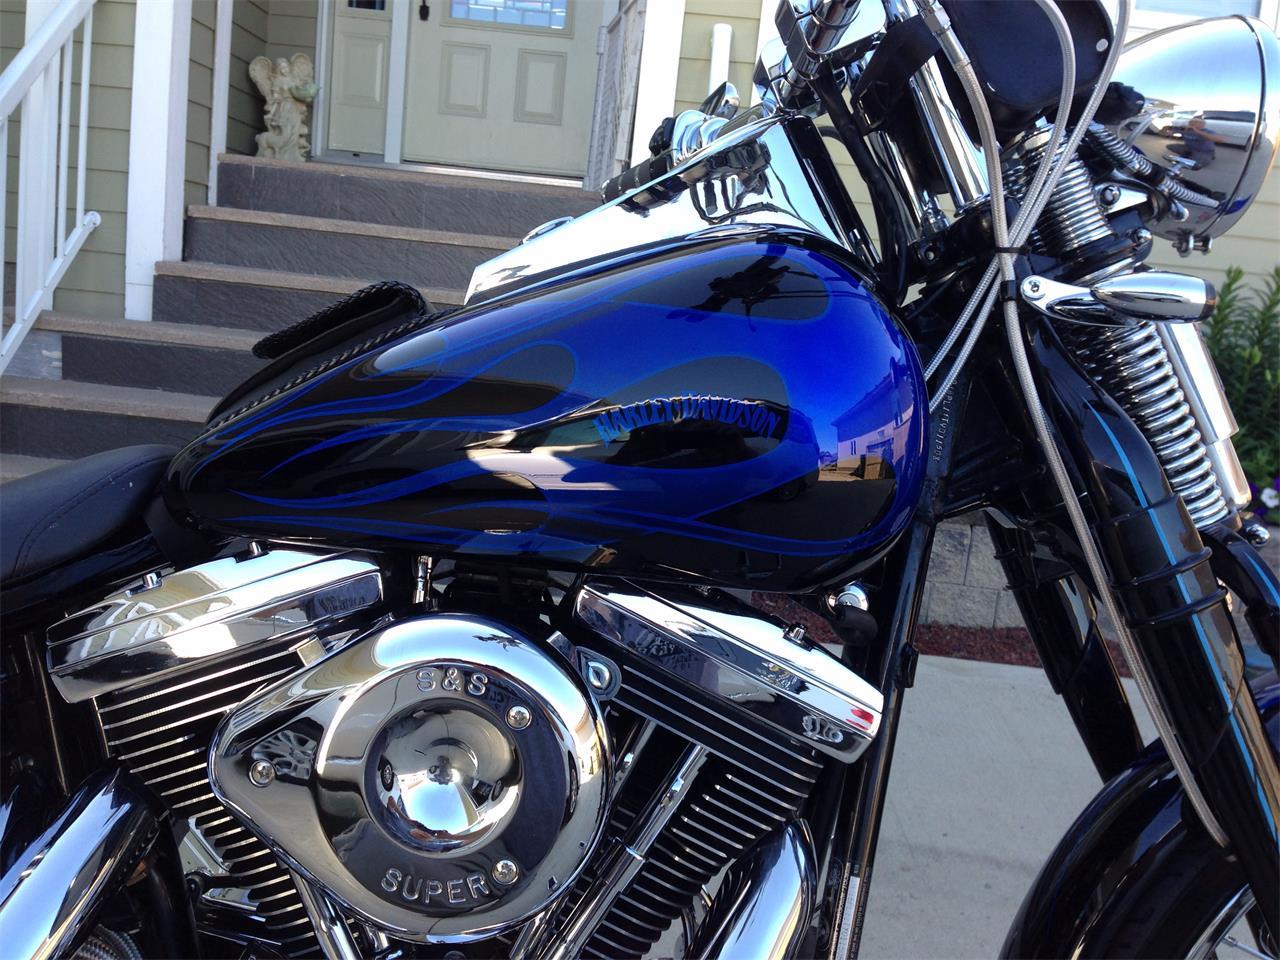 Large Picture of 1996 Harley-Davidson Motorcycle located in Saskatchewan - QBI5